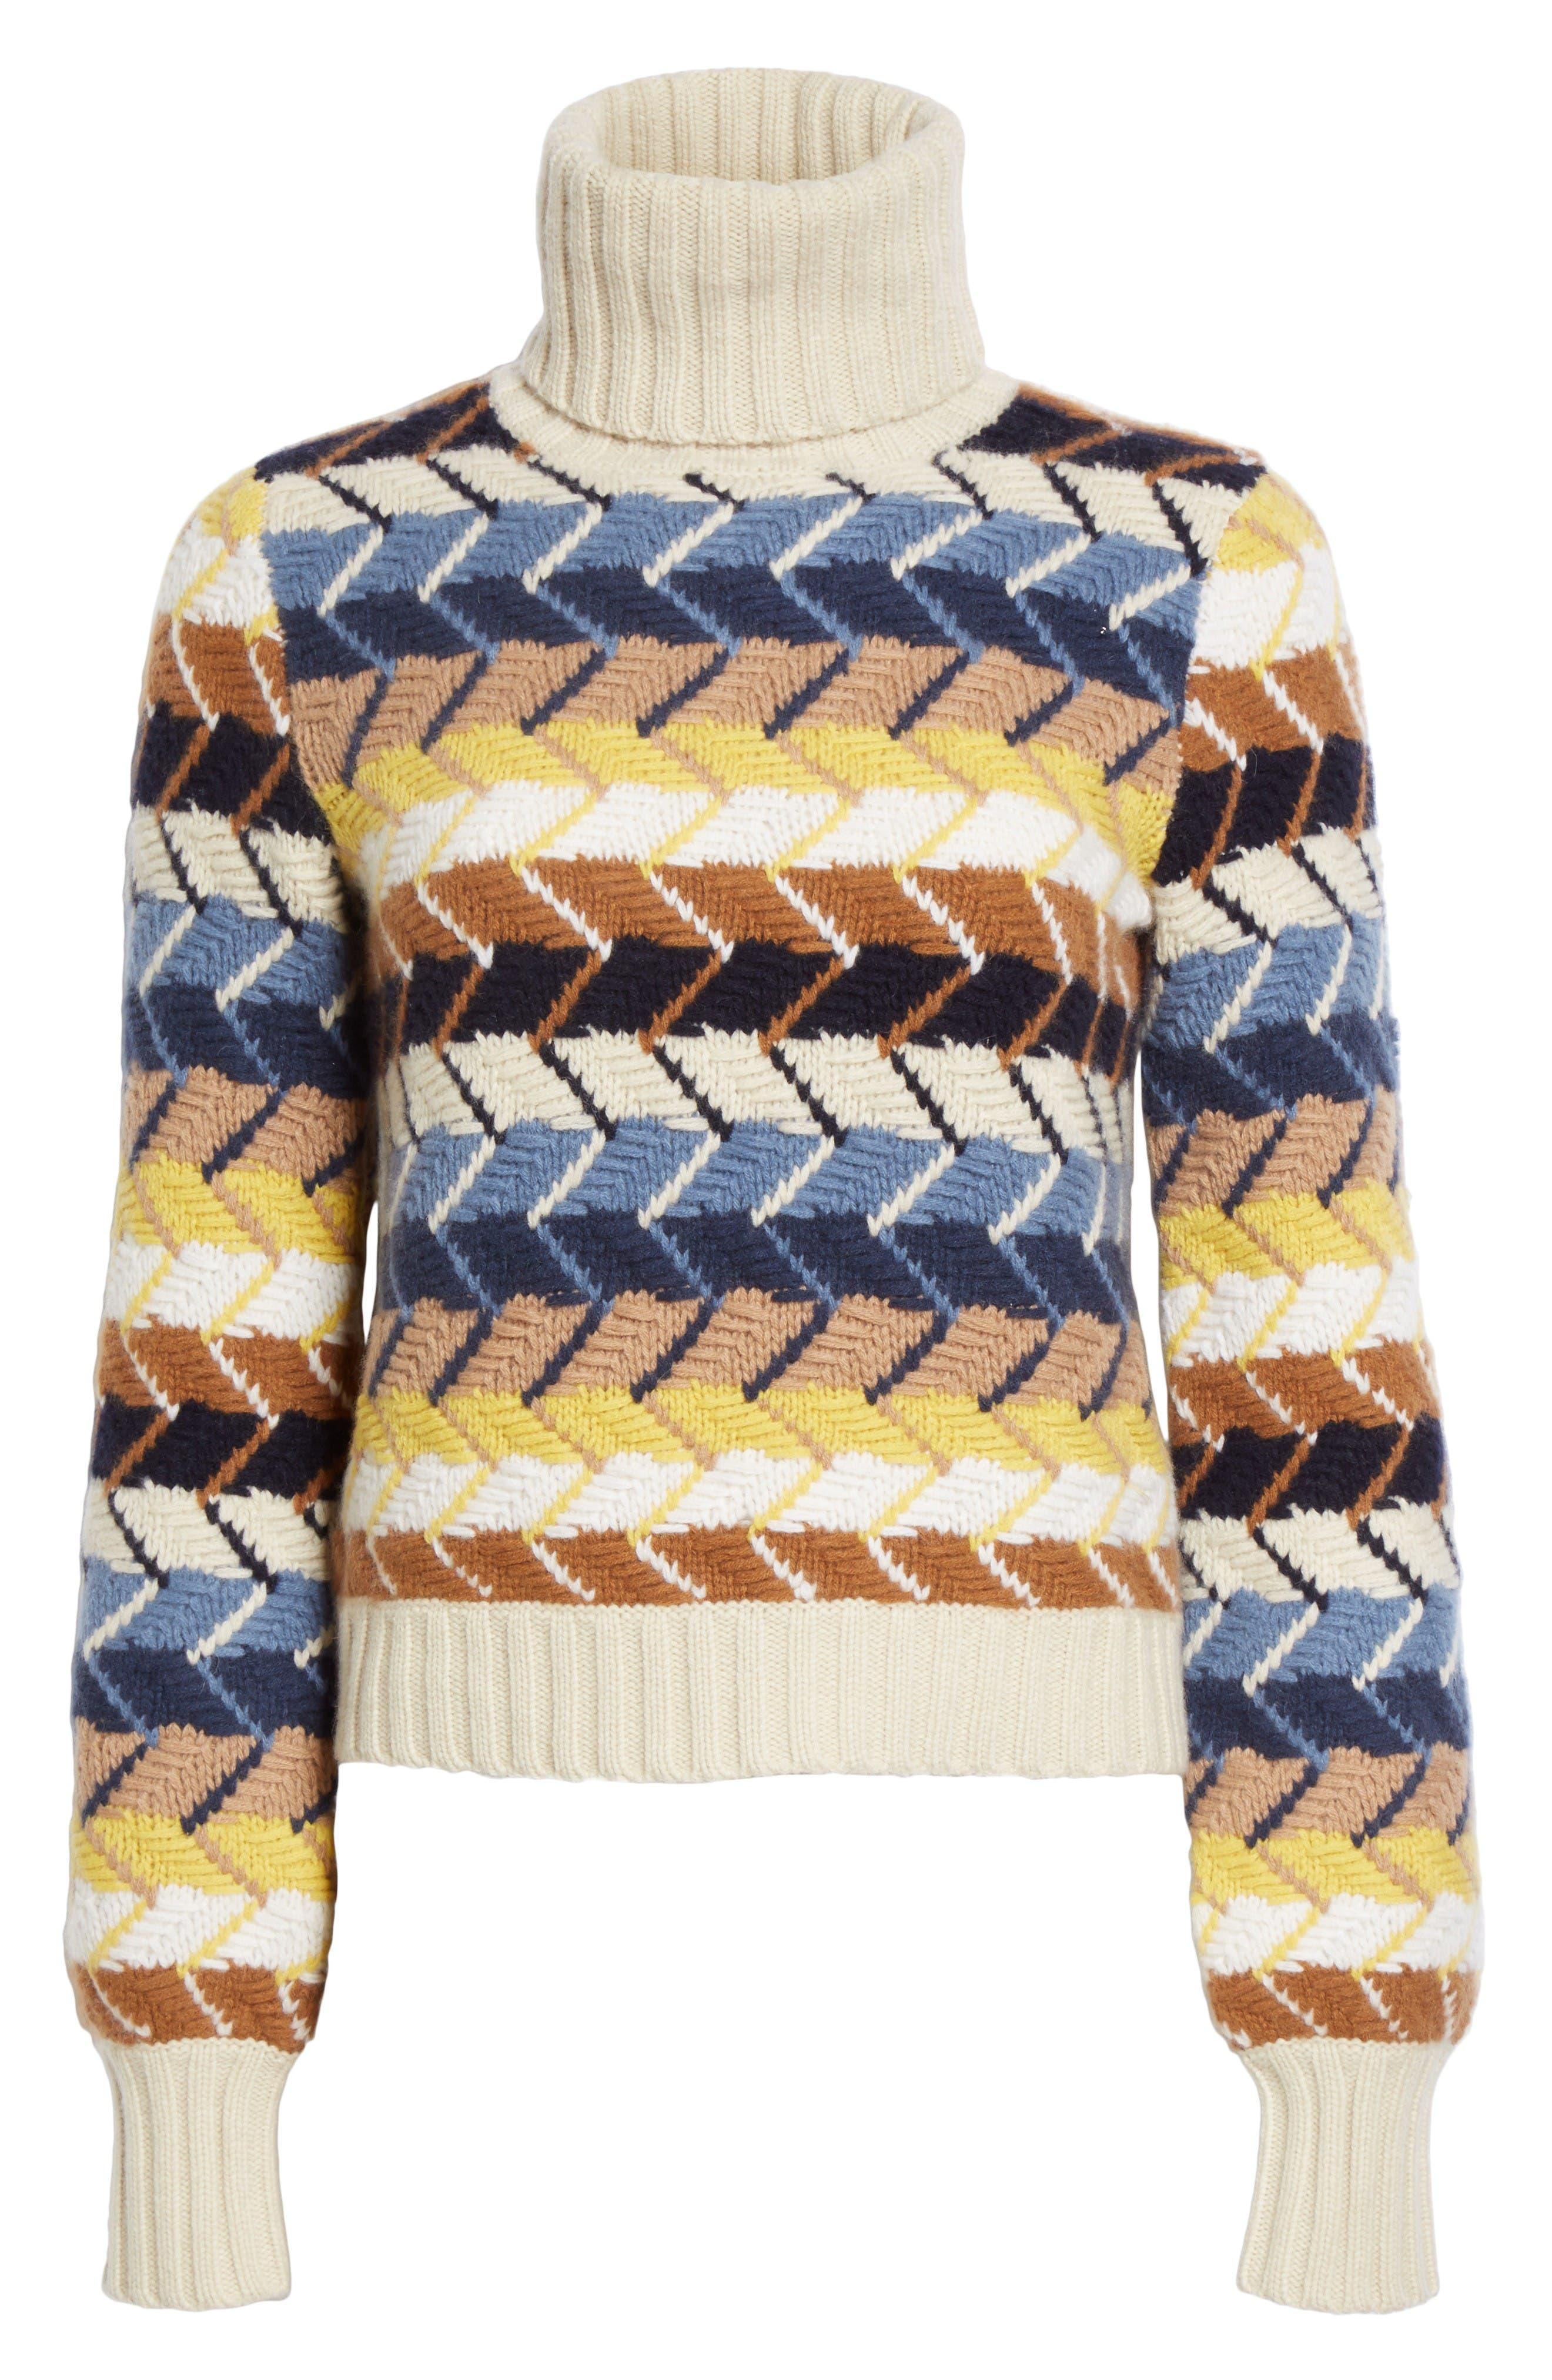 Herringbone Wool & Cashmere Turtleneck Sweater,                             Alternate thumbnail 4, color,                             Multicolor Blue